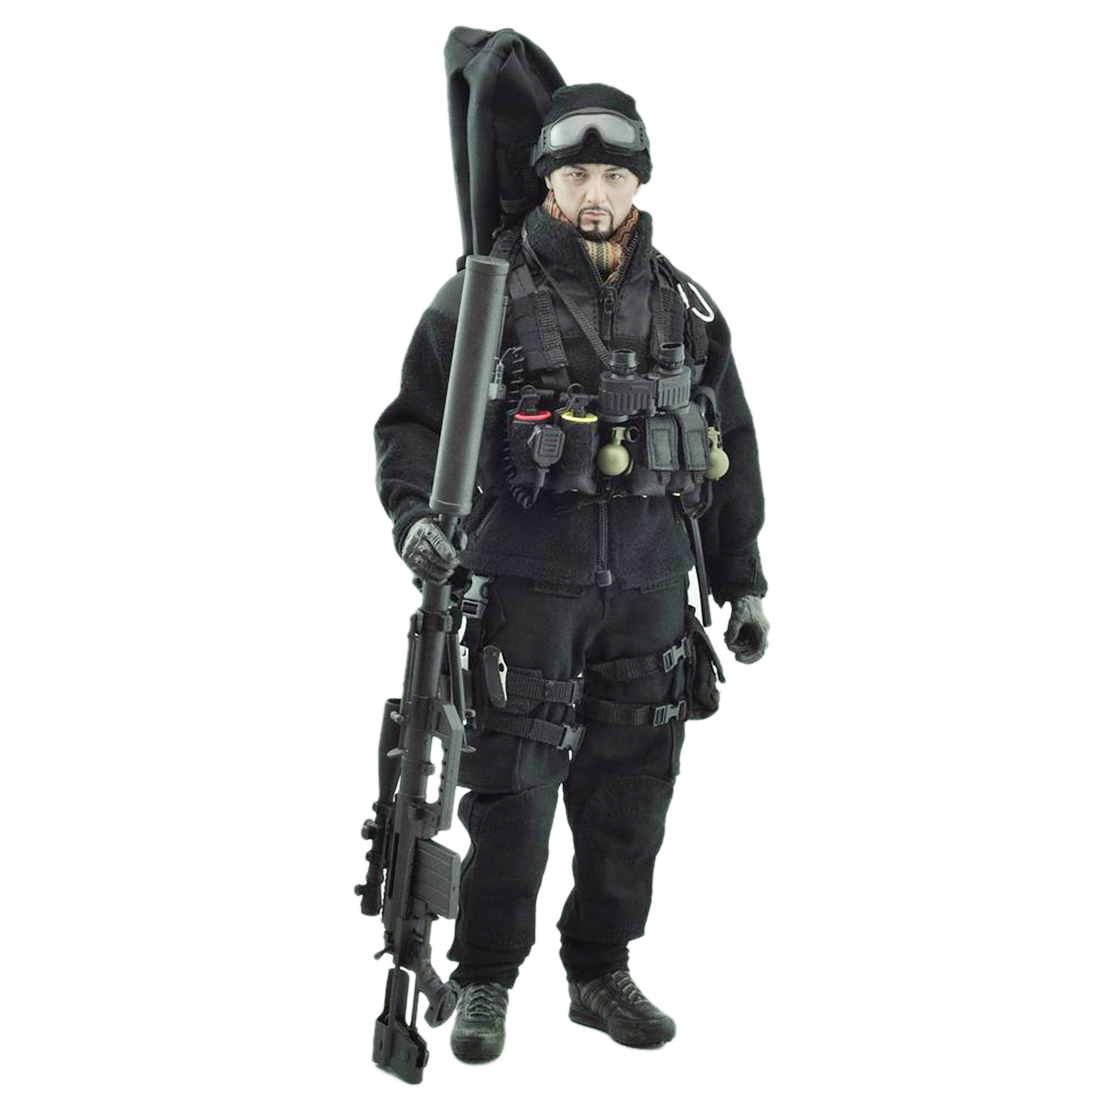 VeryHot ทหารชุดสูทสีดำ Task Sniper ชุดอุปกรณ์สำหรับ 1/6 12 นิ้วทหารชุดของขวัญ (Body หัวไม่รวม)-ใน ฟิกเกอร์แอคชันและของเล่น จาก ของเล่นและงานอดิเรก บน   1